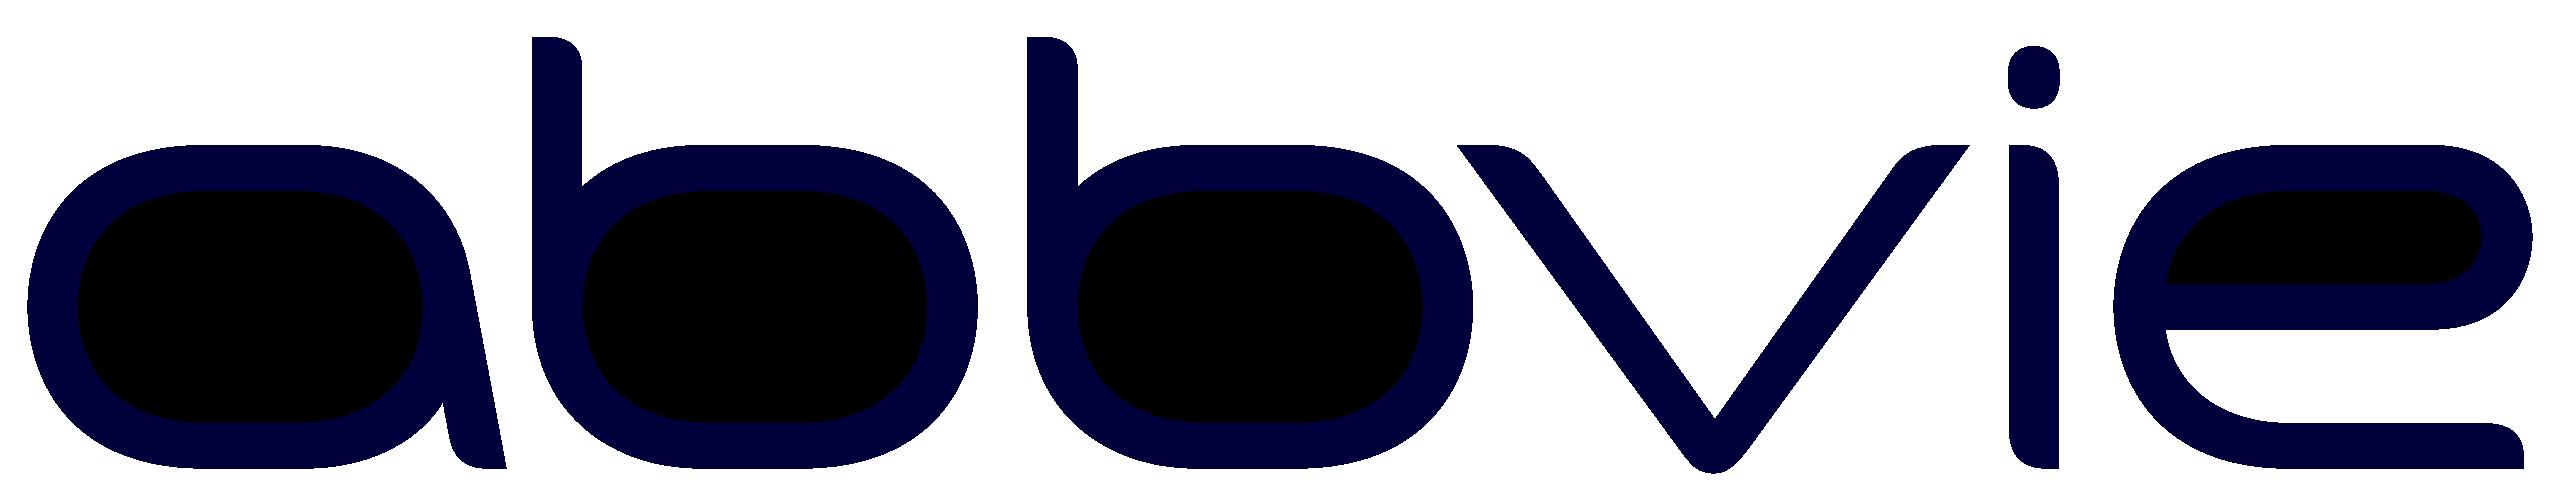 AbbVie Pharmaceutical Research & Development